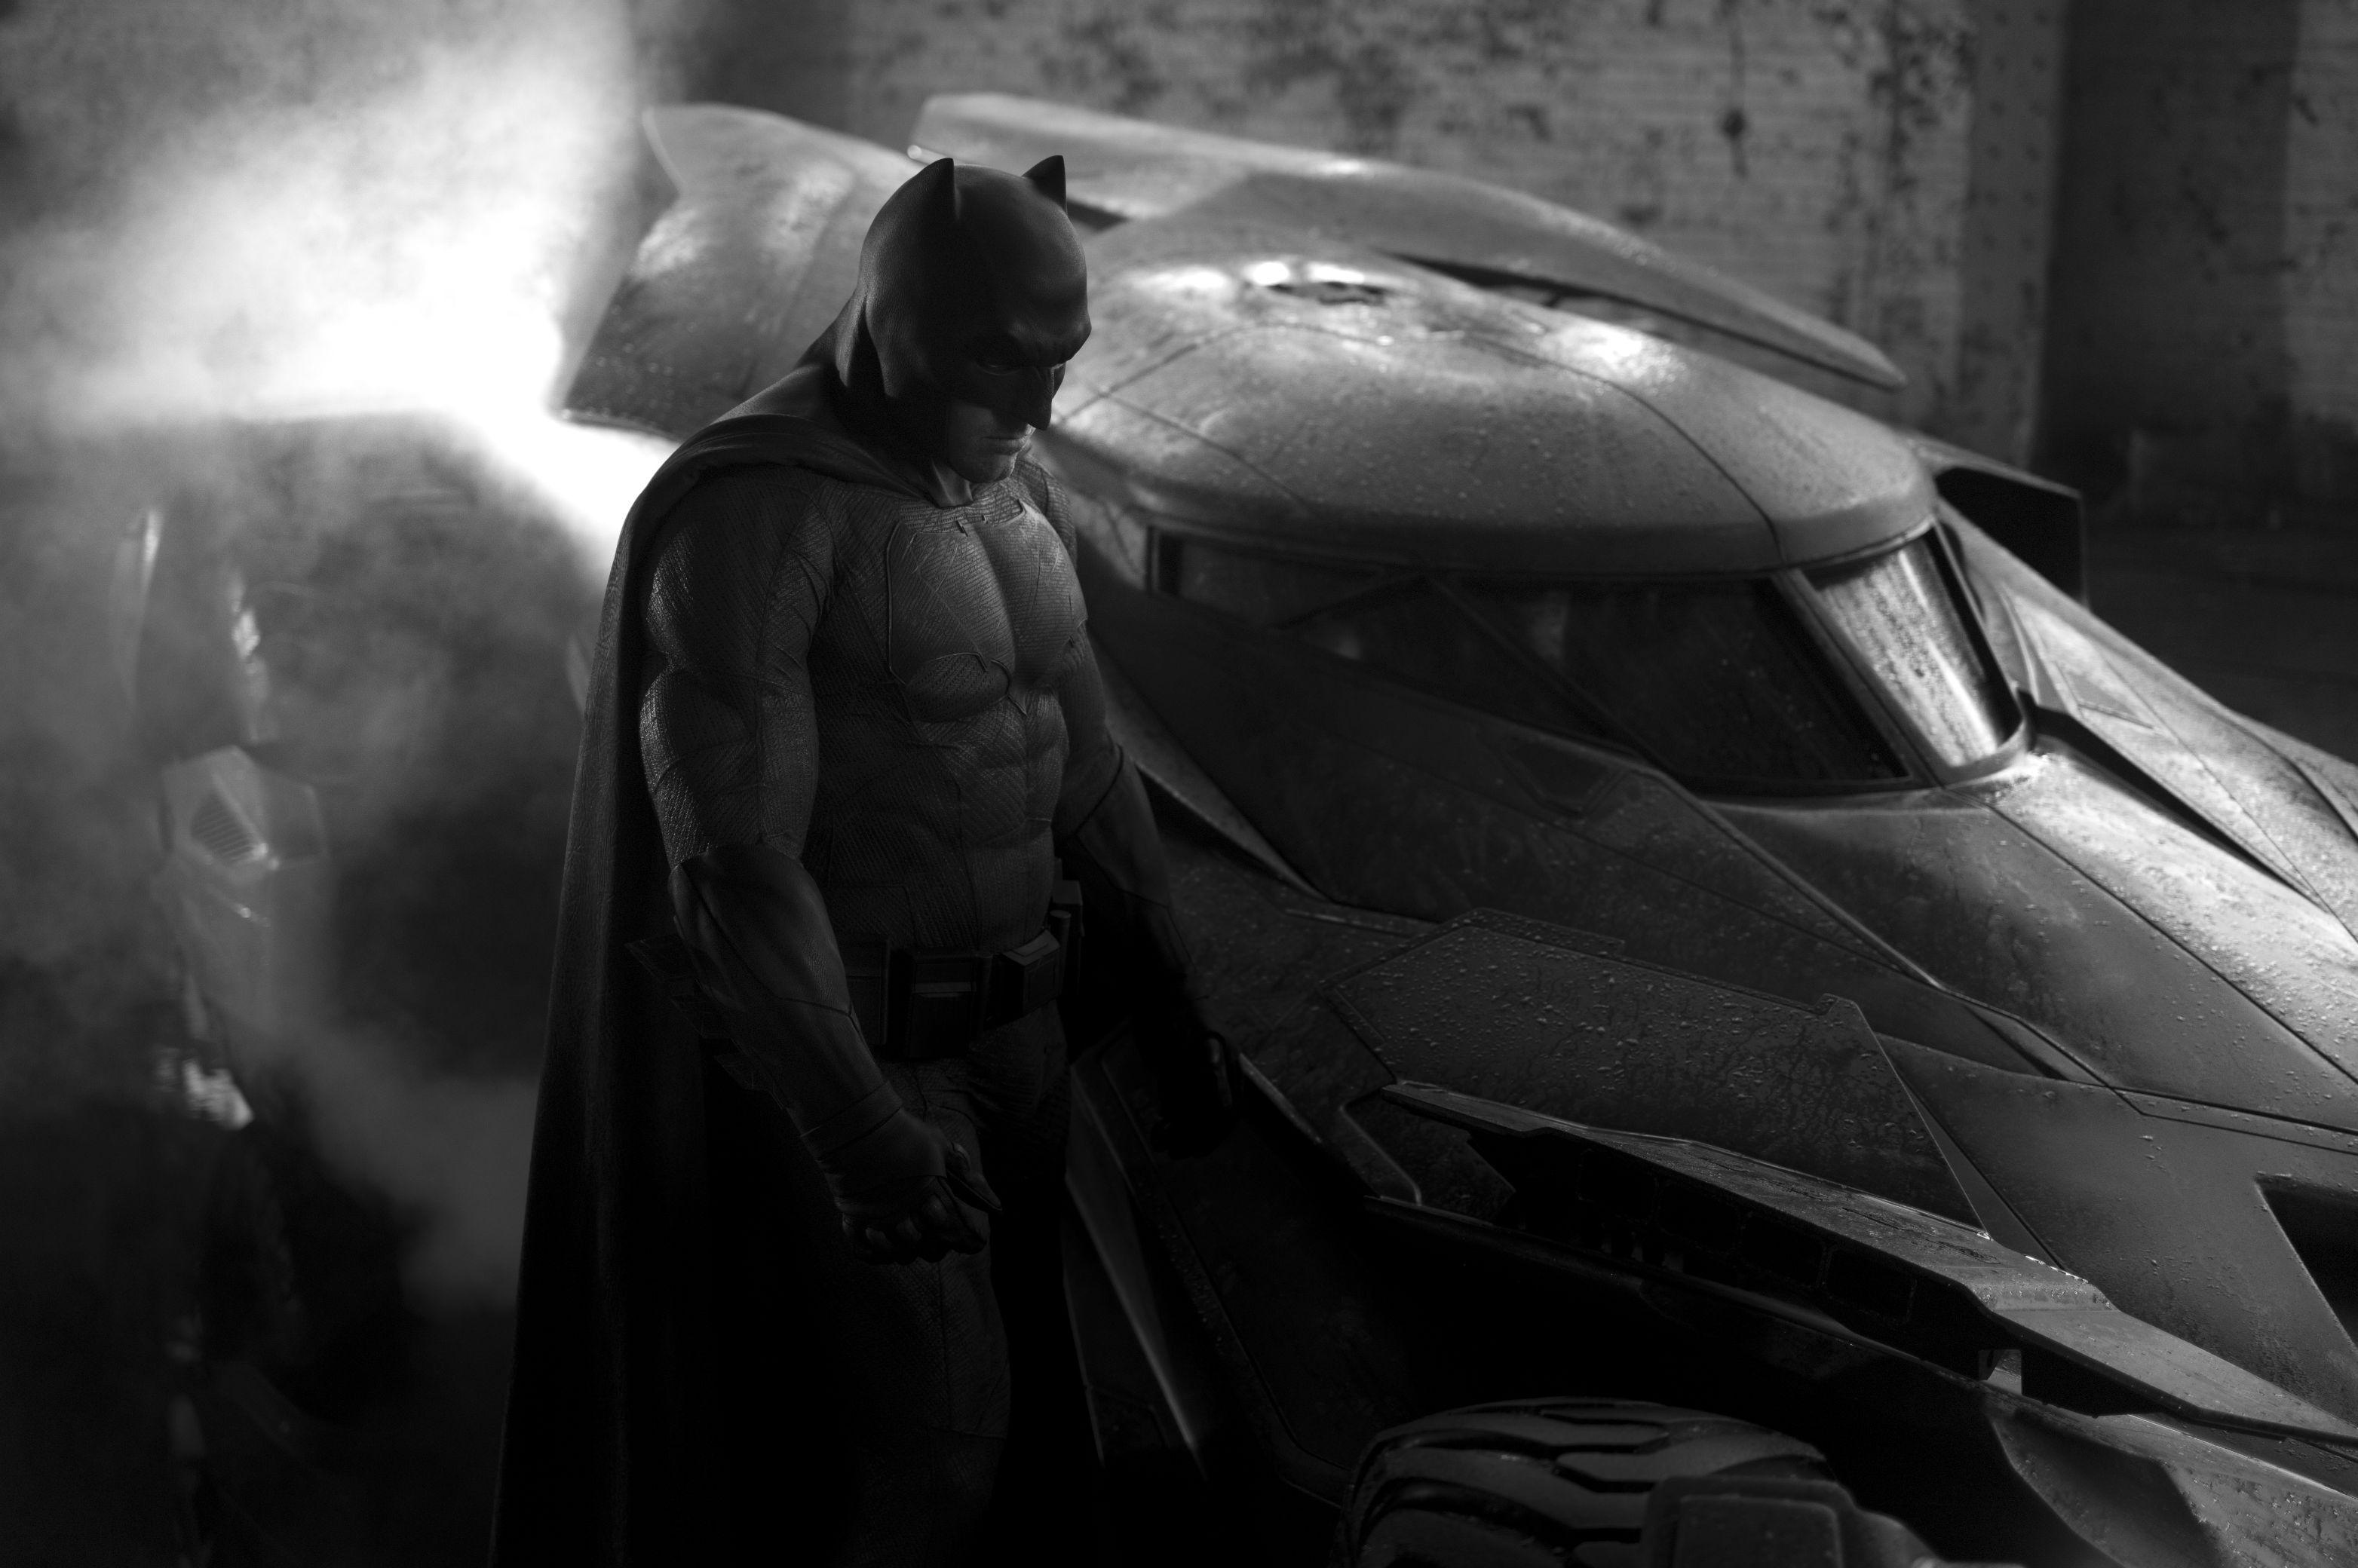 Zack Snyder Reveals First Photo of Ben Affleck as Batman and the 'Batman vs. Superman' Batmobile!